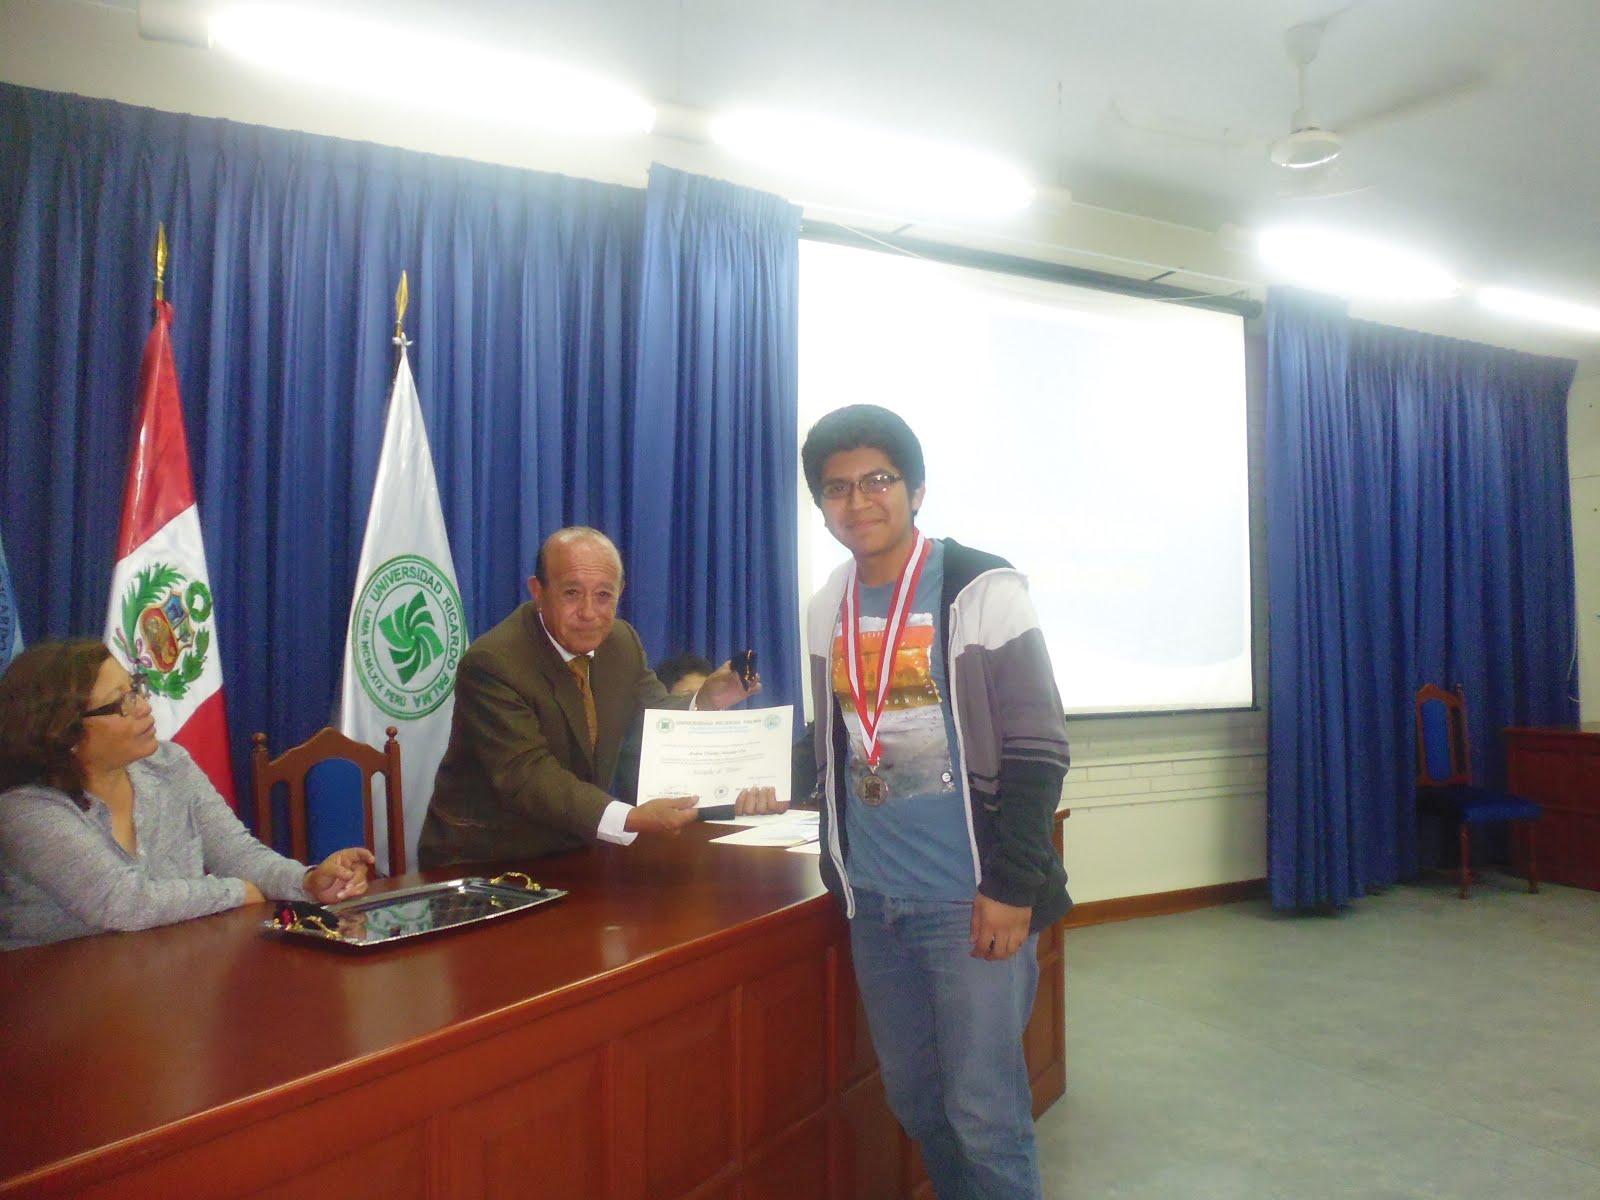 SUBCAMPEON NACIONAL DE LA IX OLIMPIADA PERUANA DE BIOLOGIA OPB 2014.